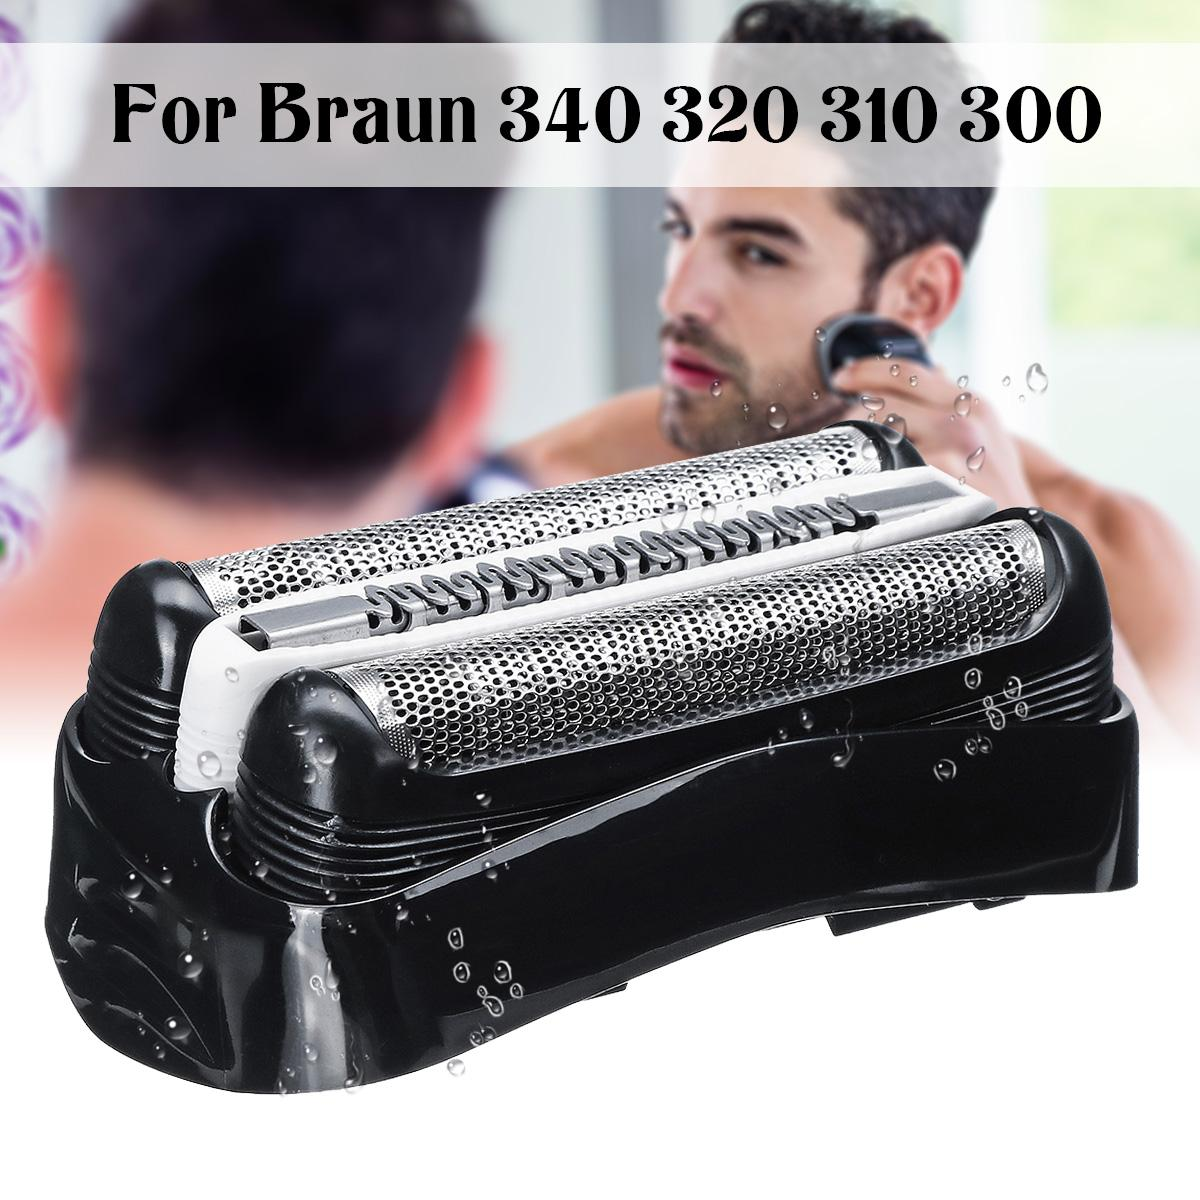 Black Shaver Replacement Foil Head for Braun Series 3 32B 3090cc 3050cc 3040s 3020 340 320 Male Shaver Razor Cutter Head